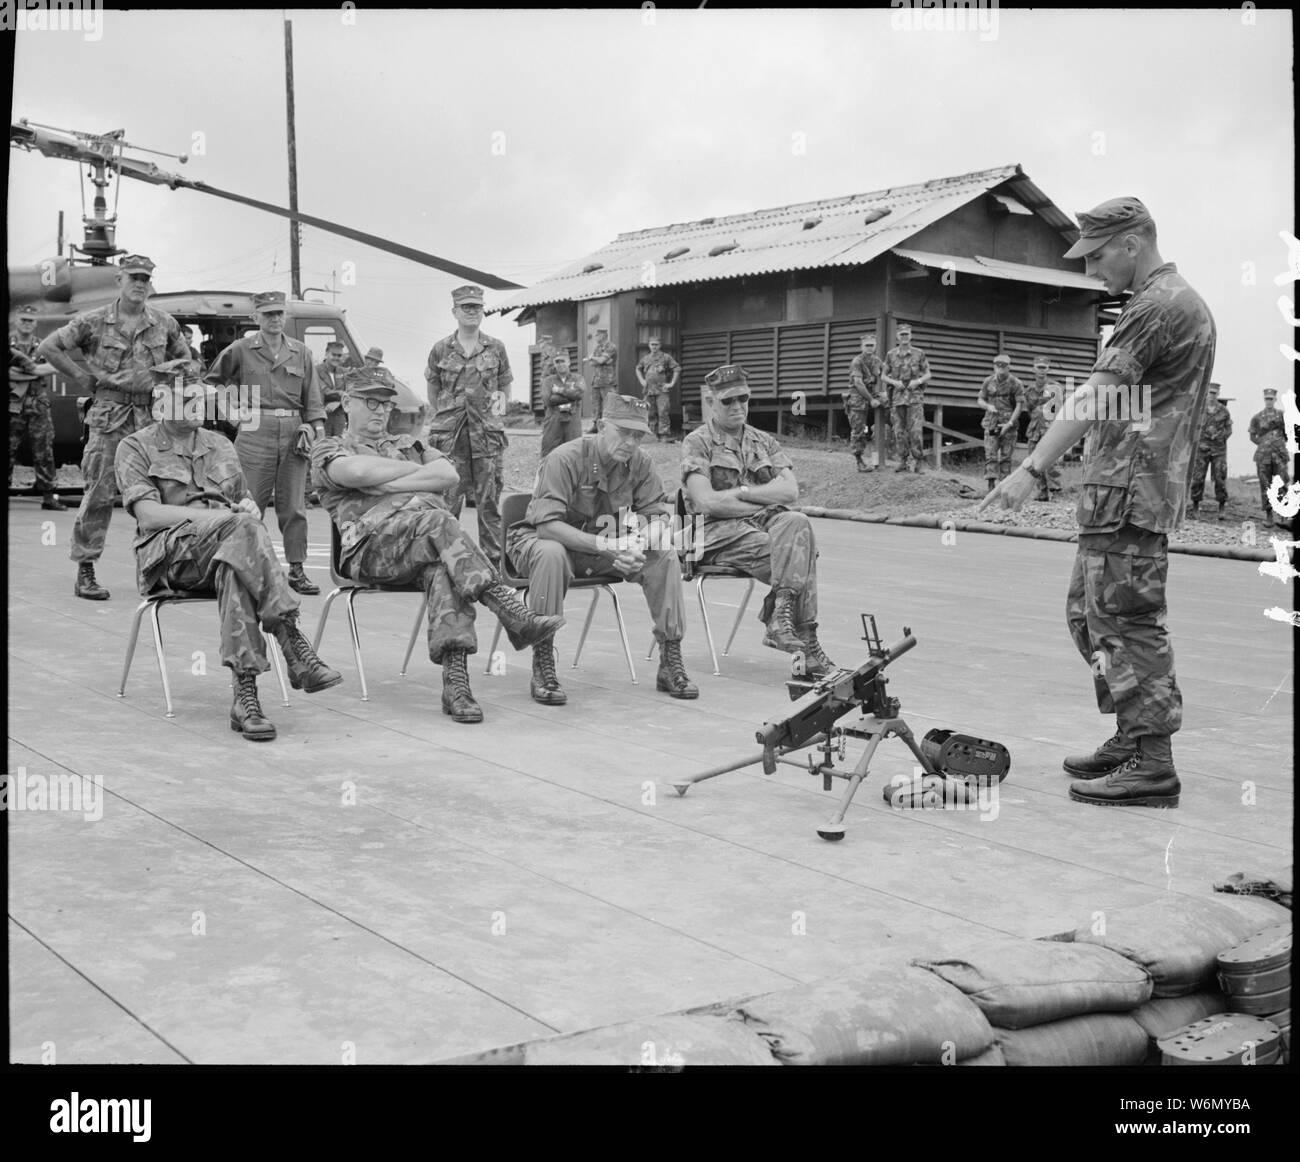 Grenade Vietnam Stock Photos & Grenade Vietnam Stock Images - Alamy